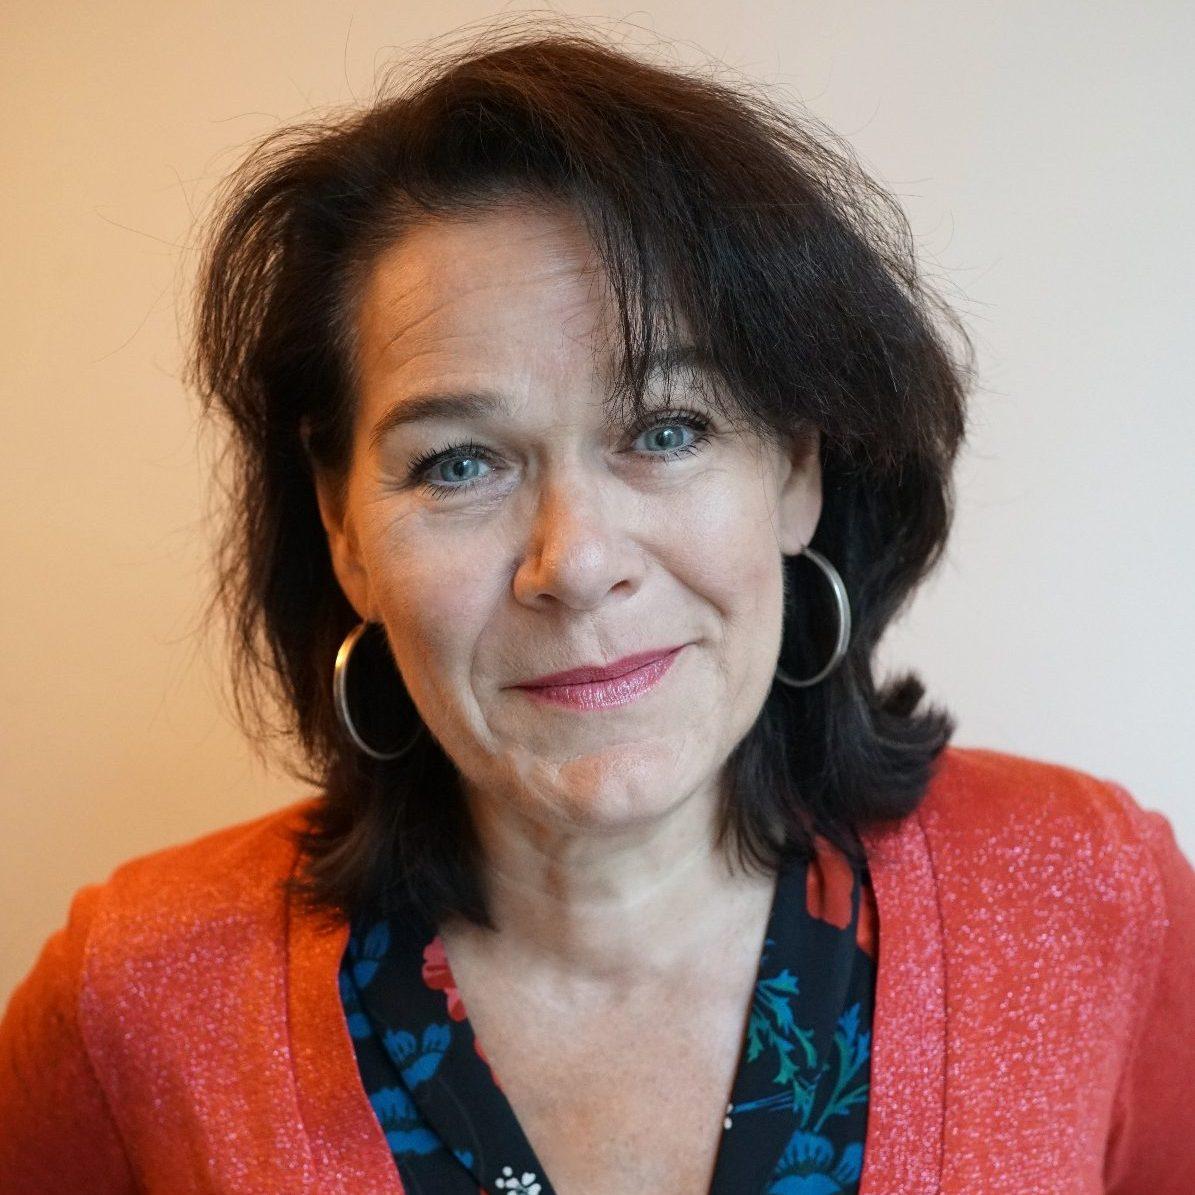 Natascha Bregstein